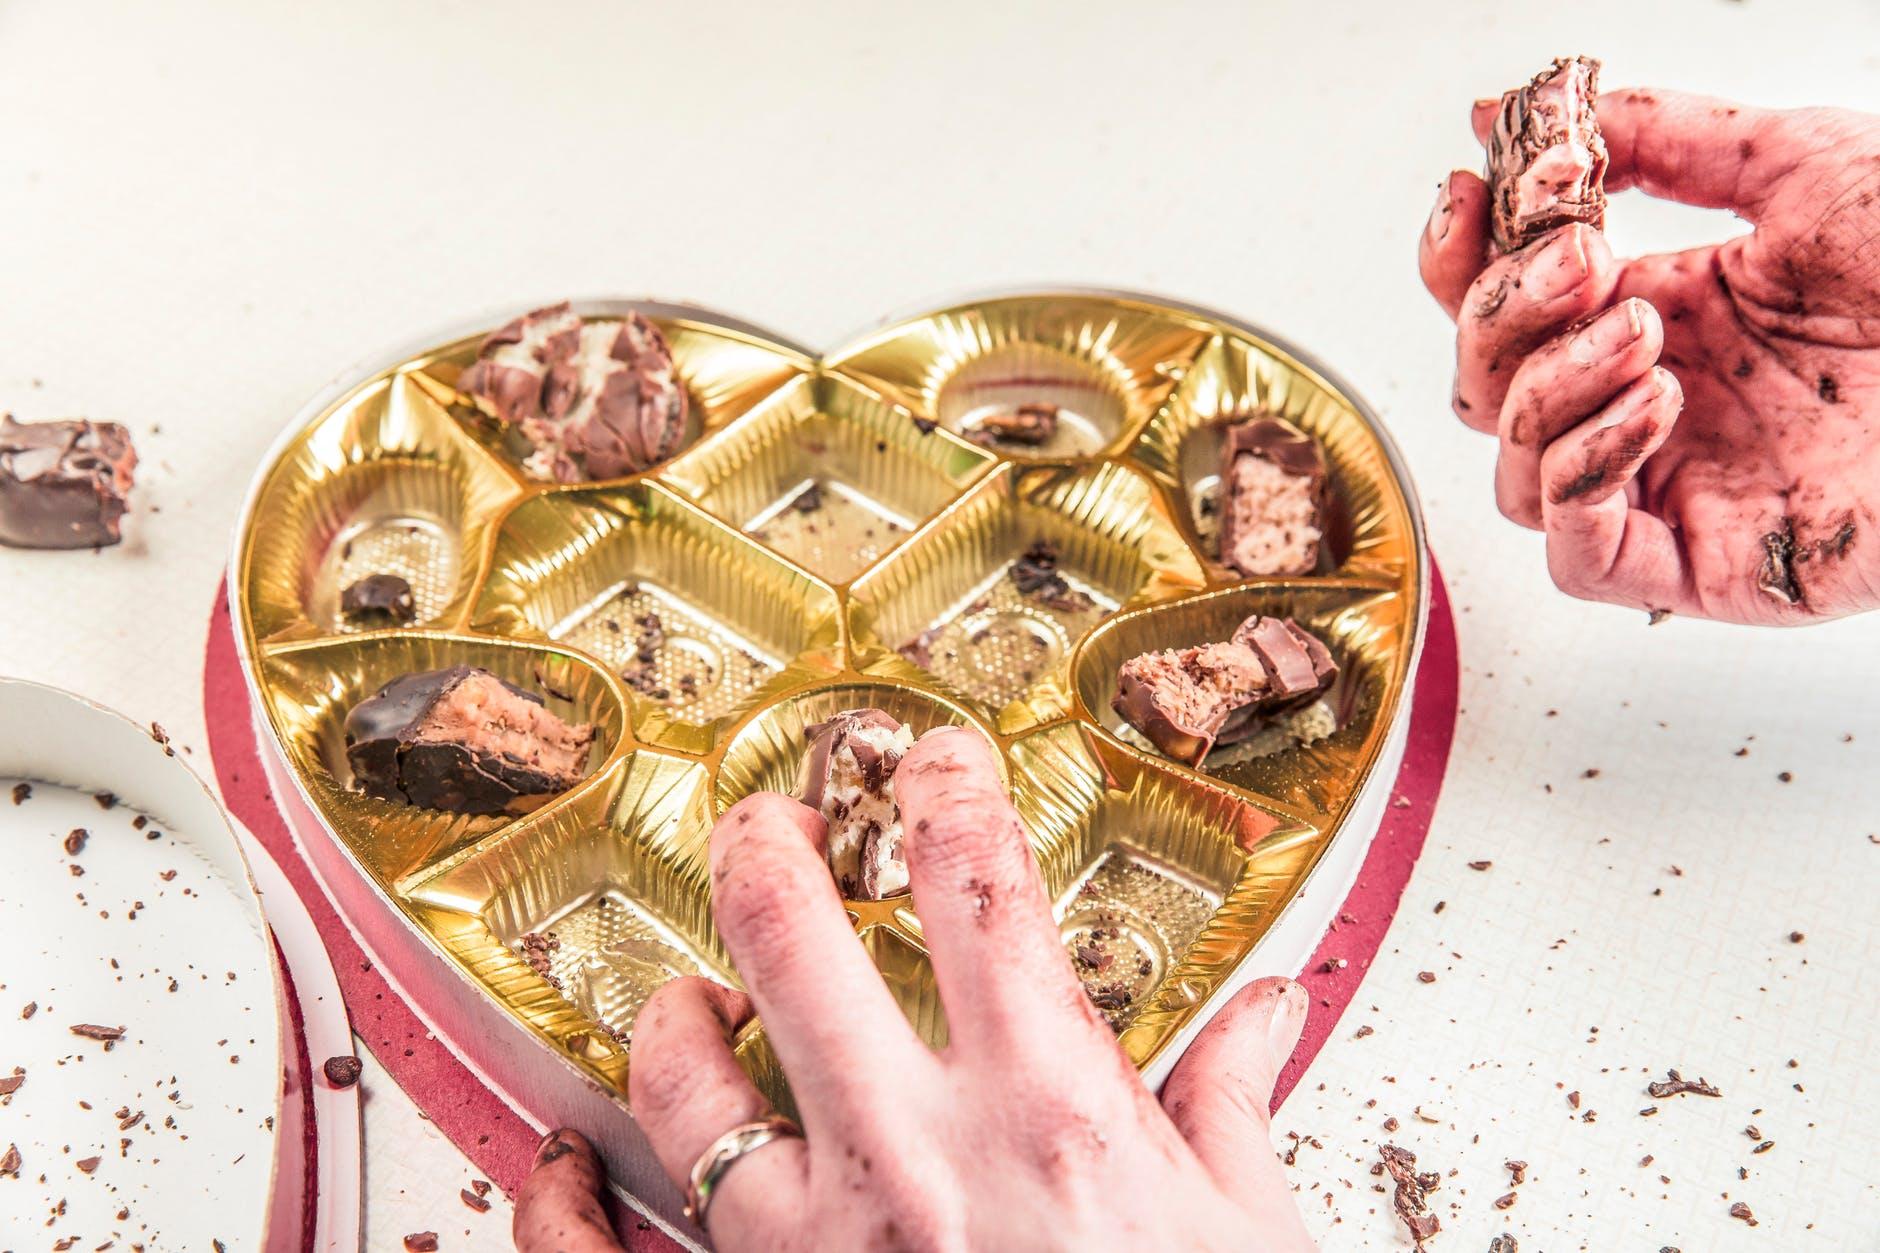 Eating-chocolates.jpg